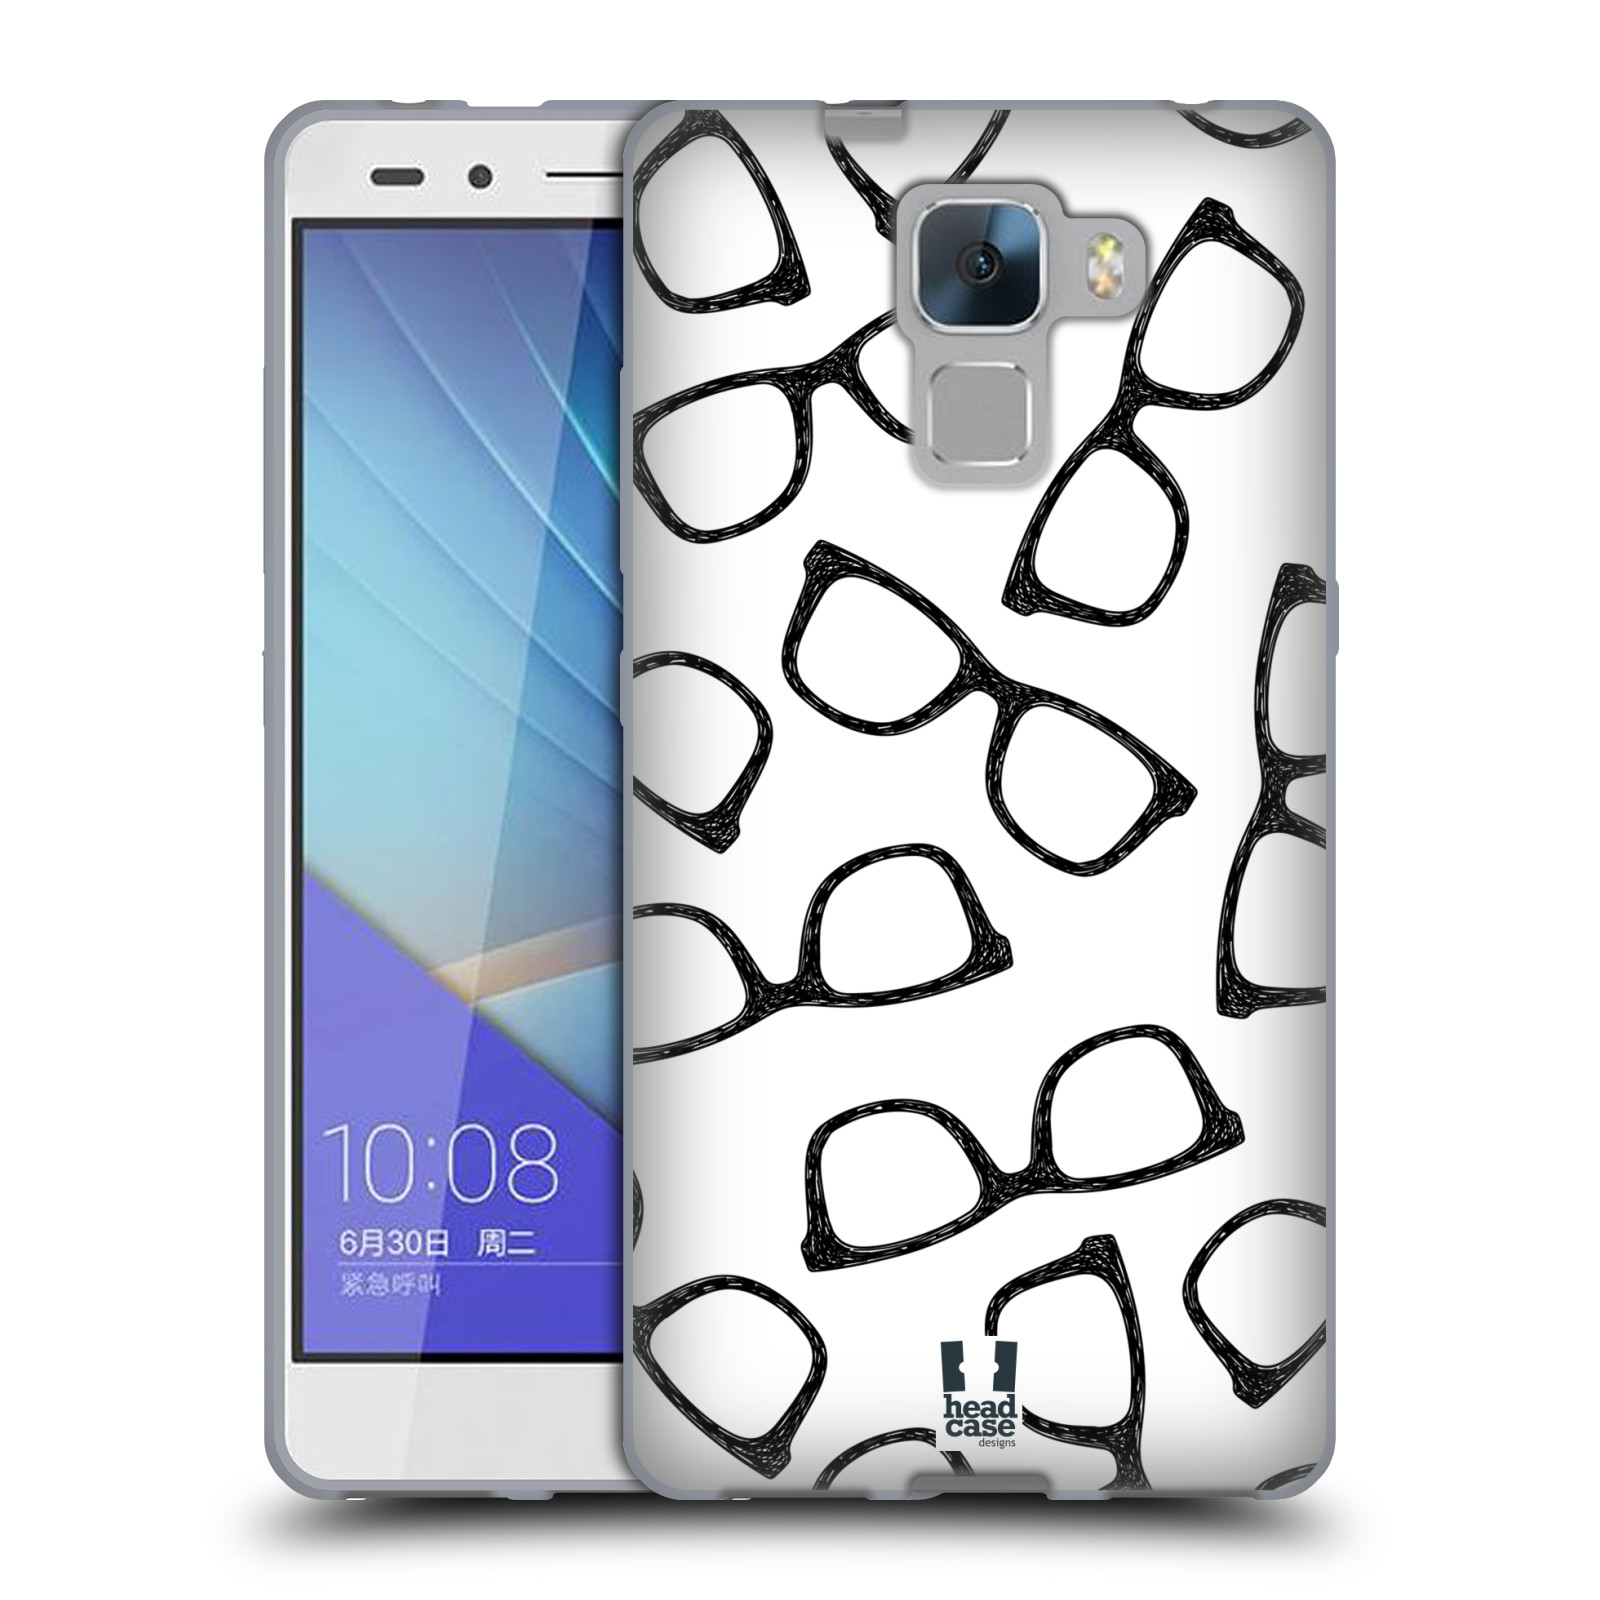 Silikonové pouzdro na mobil Honor 7 HEAD CASE HIPSTER BRÝLE (Silikonový kryt či obal na mobilní telefon Huawei Honor 7)